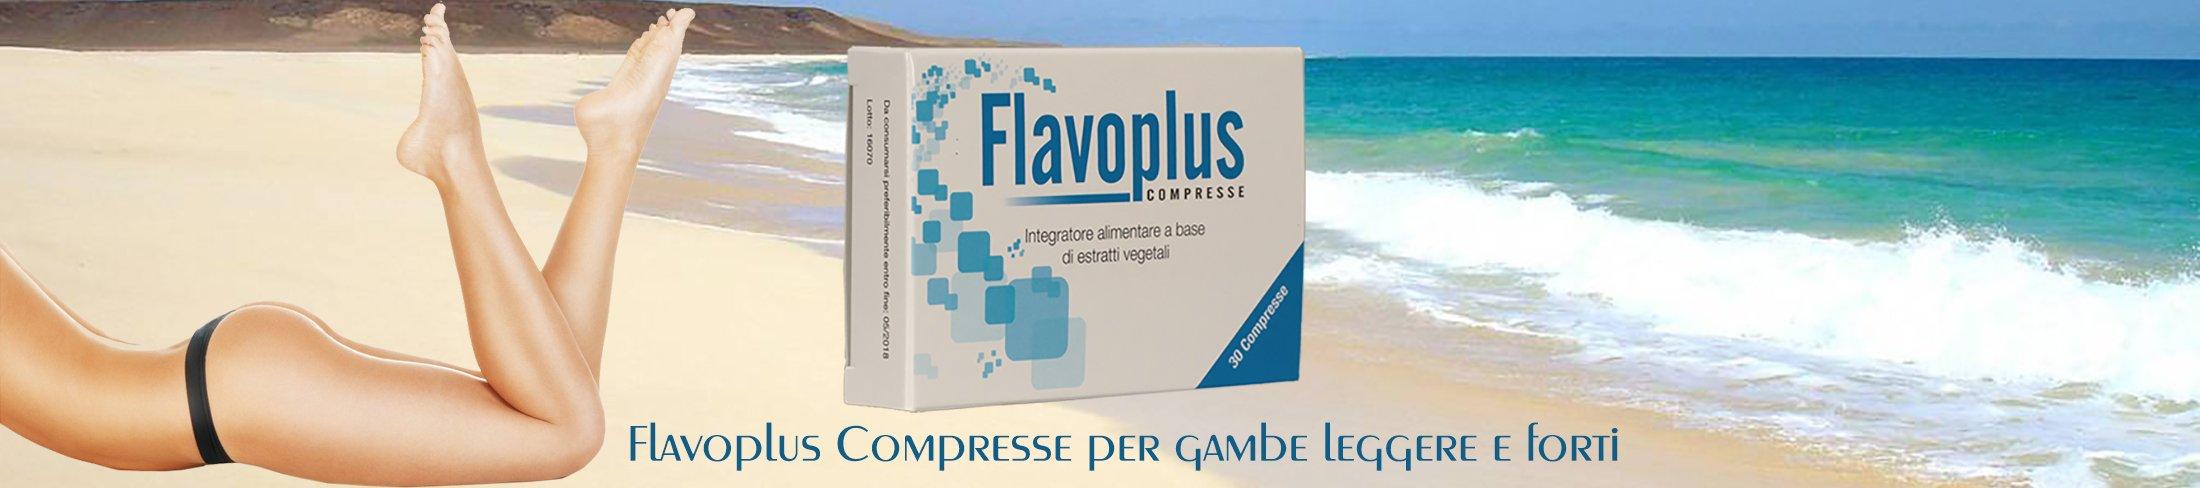 BROTHERMEDICALS SRL: Flavoplus compresse - per gambe leggere e forti.